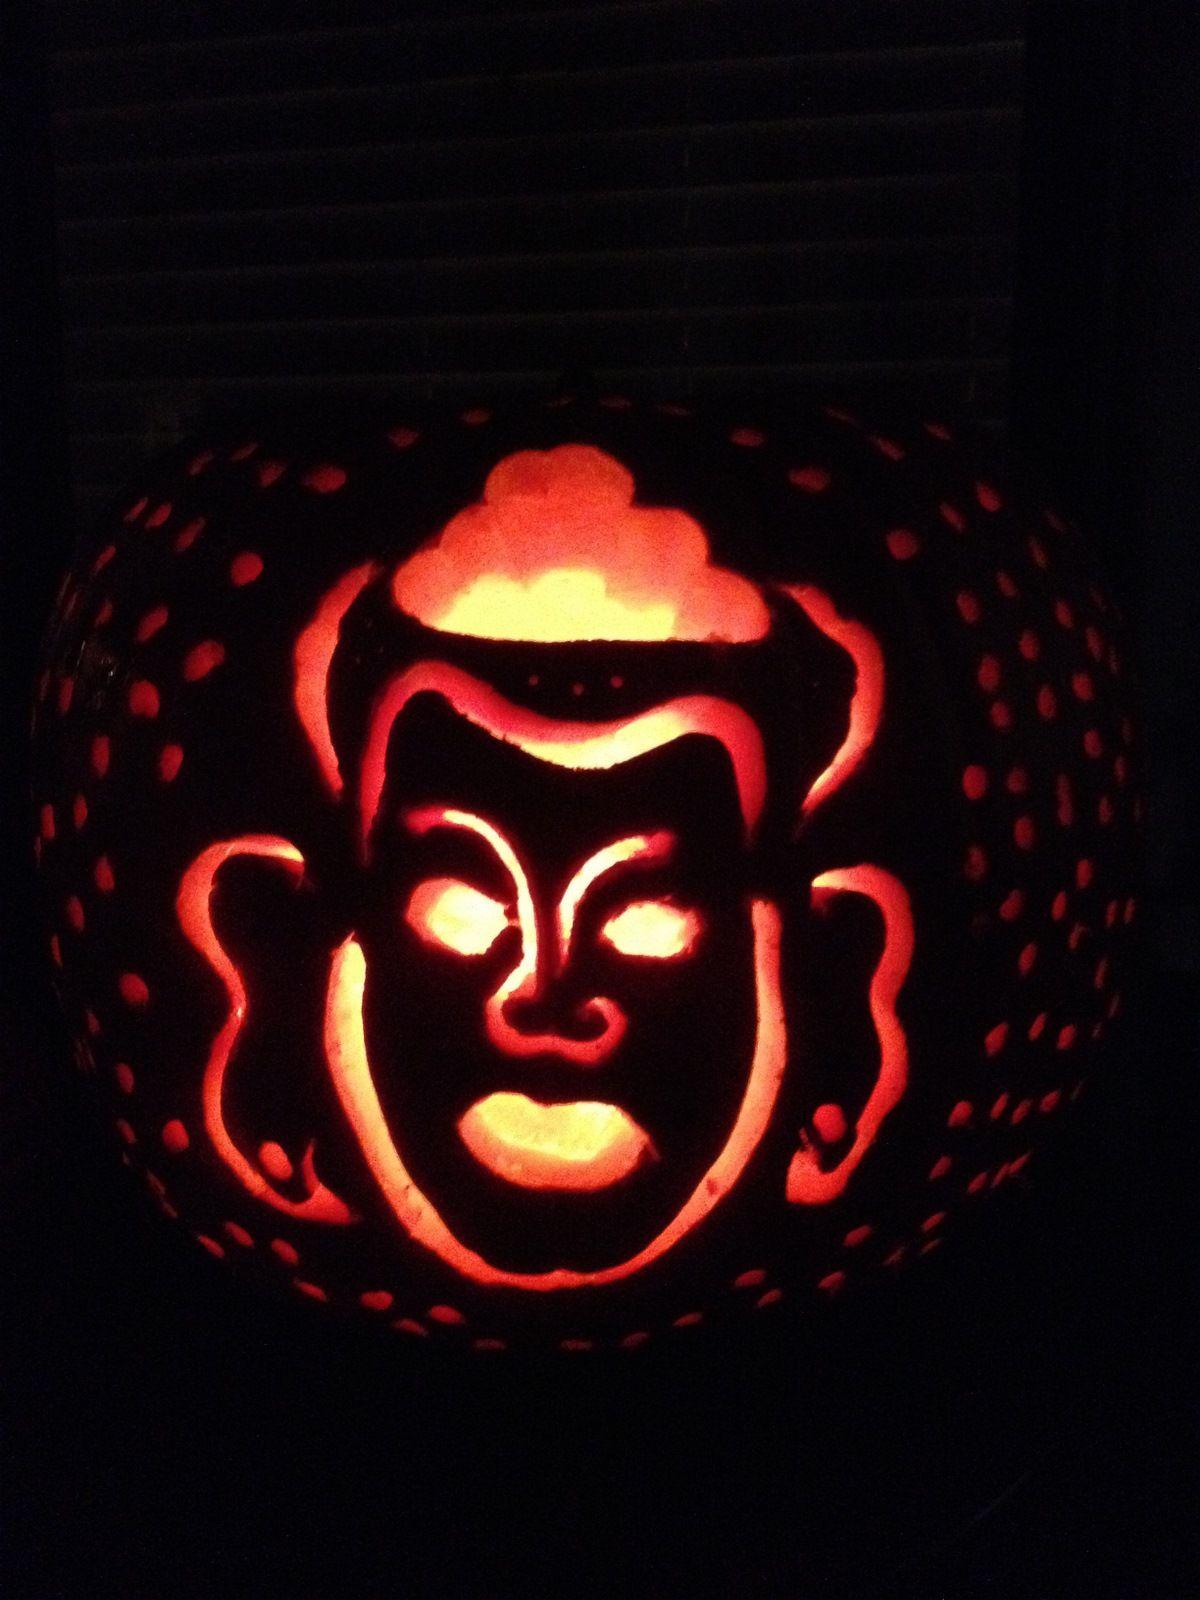 Halloween Lord Buddha Carved Pumpkin Seth Lieberman Pumpkin Carving Pumpkin Pumpkin Stencil